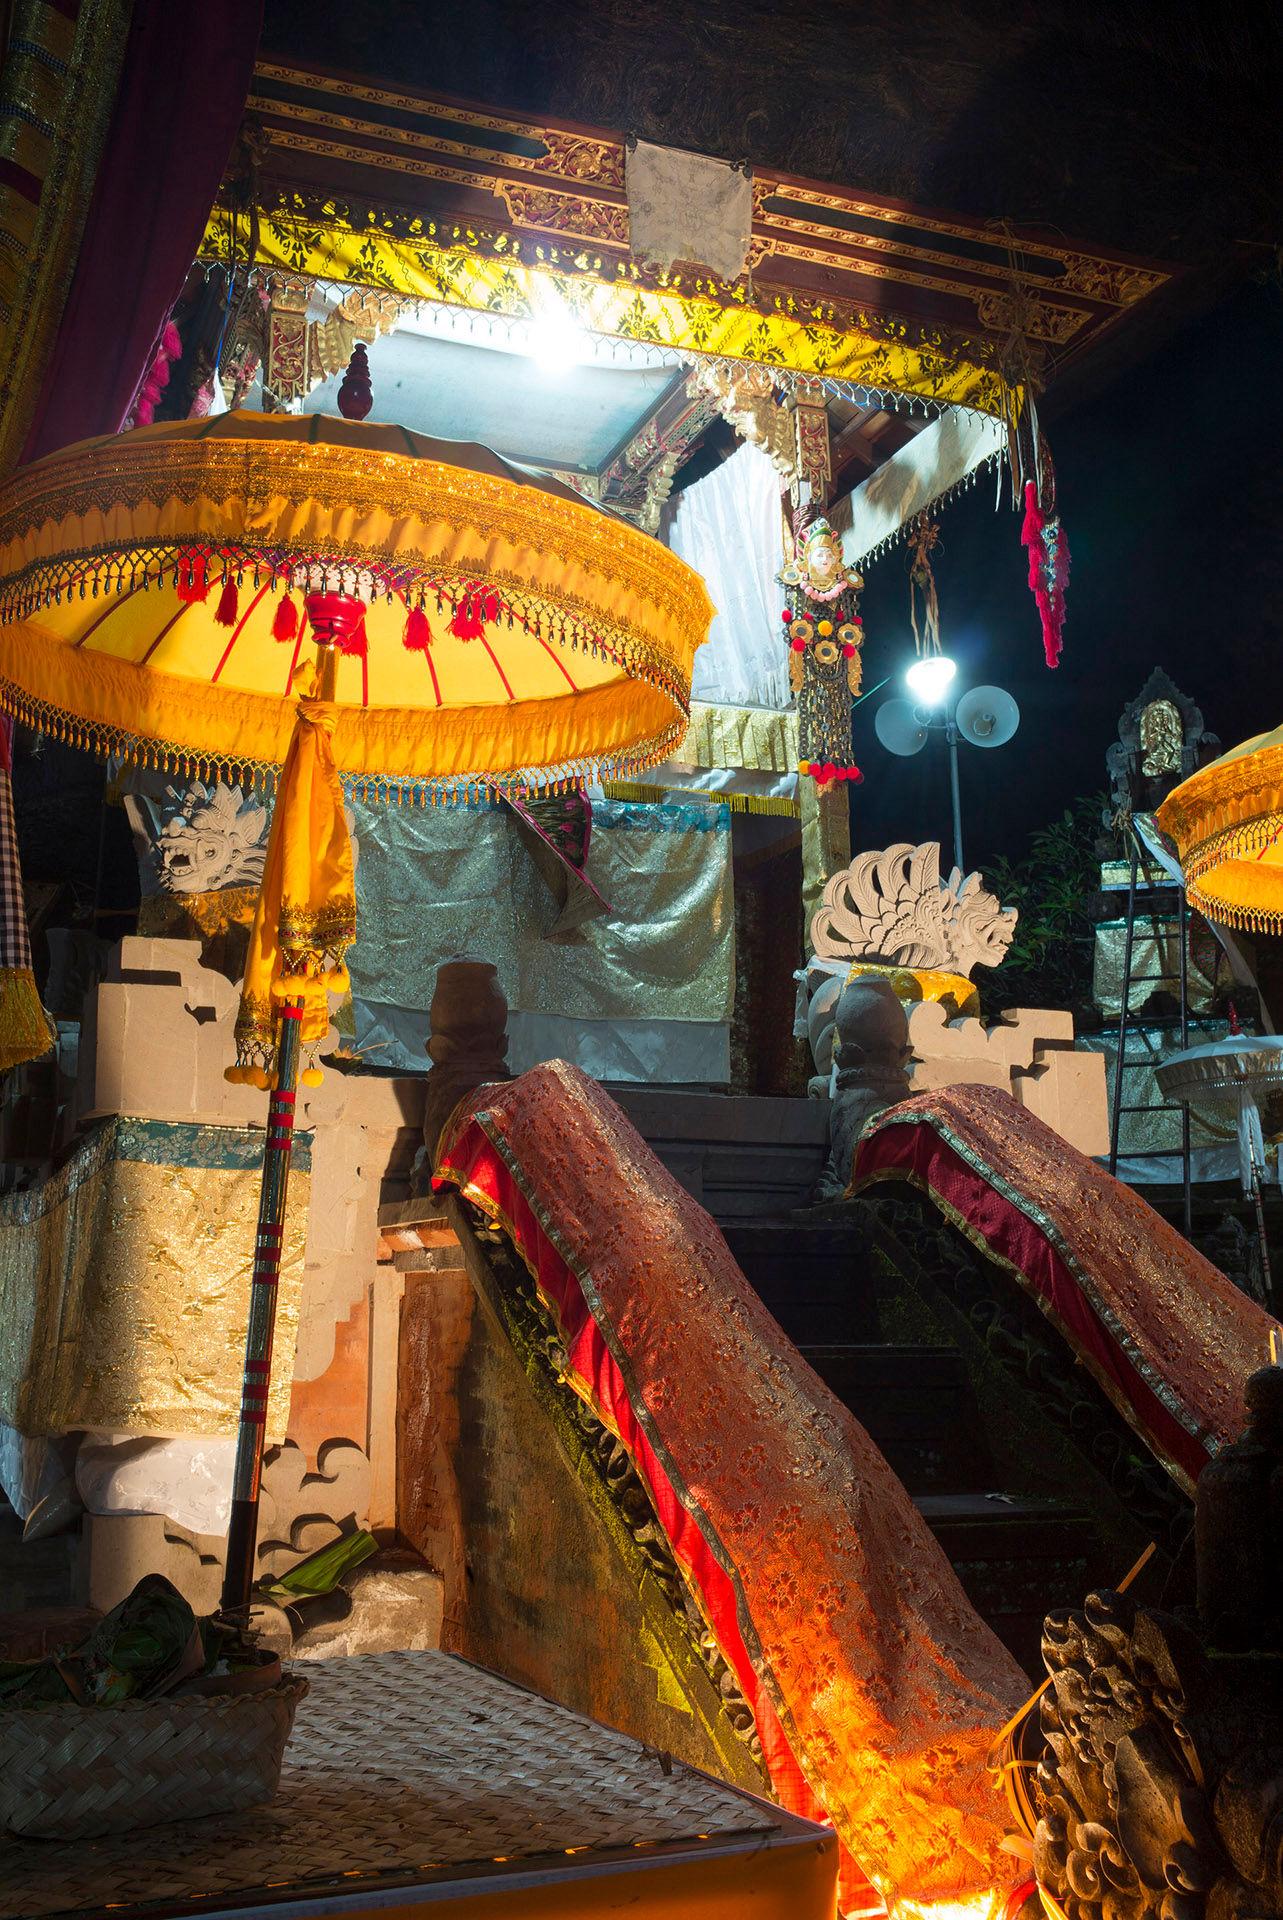 Bali Penestanan Temple #2